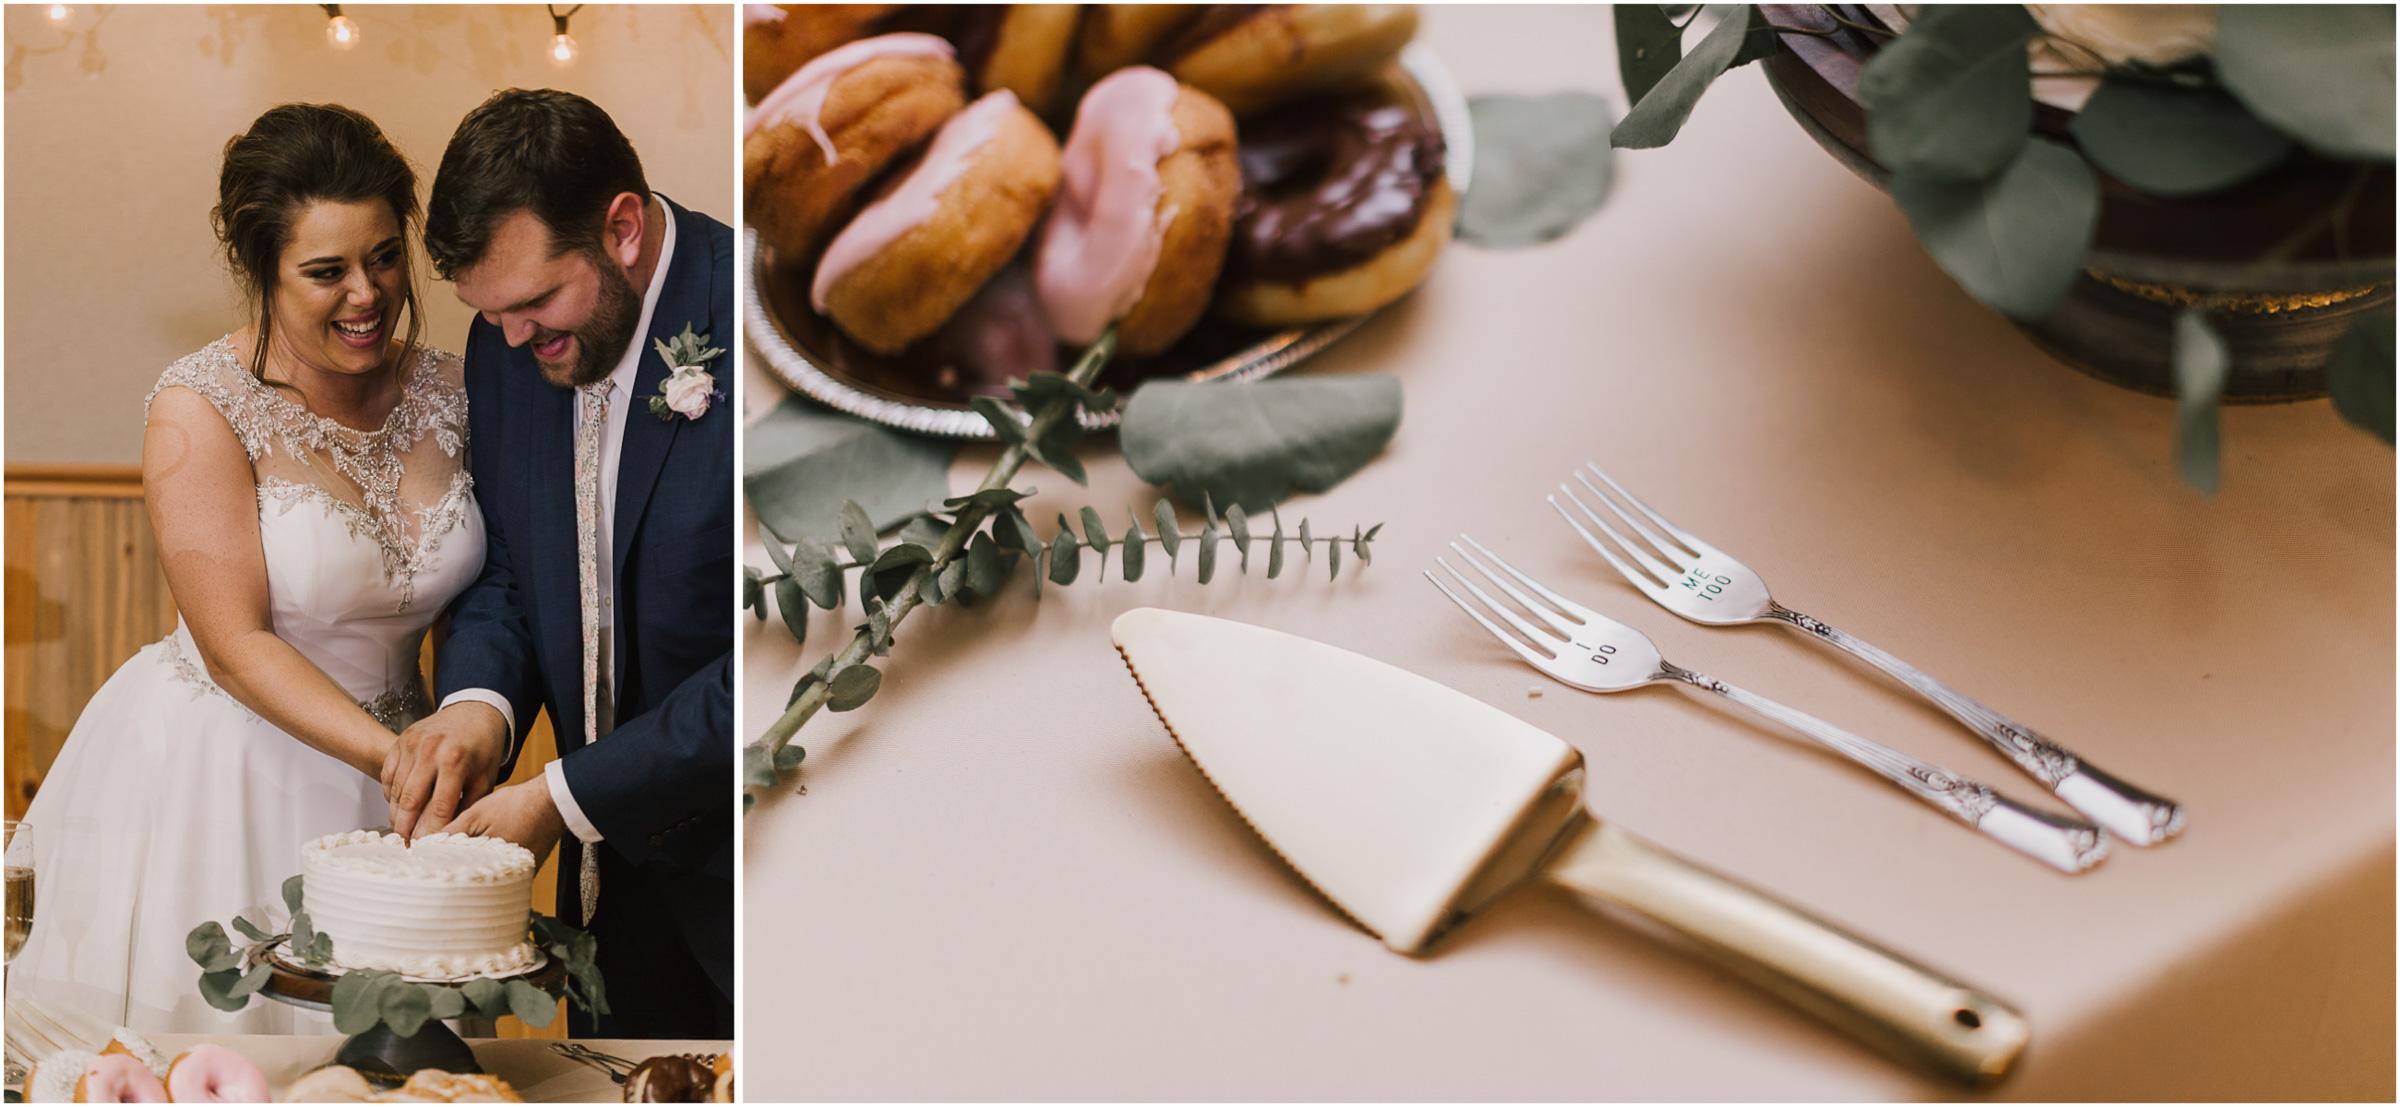 alyssa barletter photography summer odessa missouri wedding kansas city photographer-77.jpg